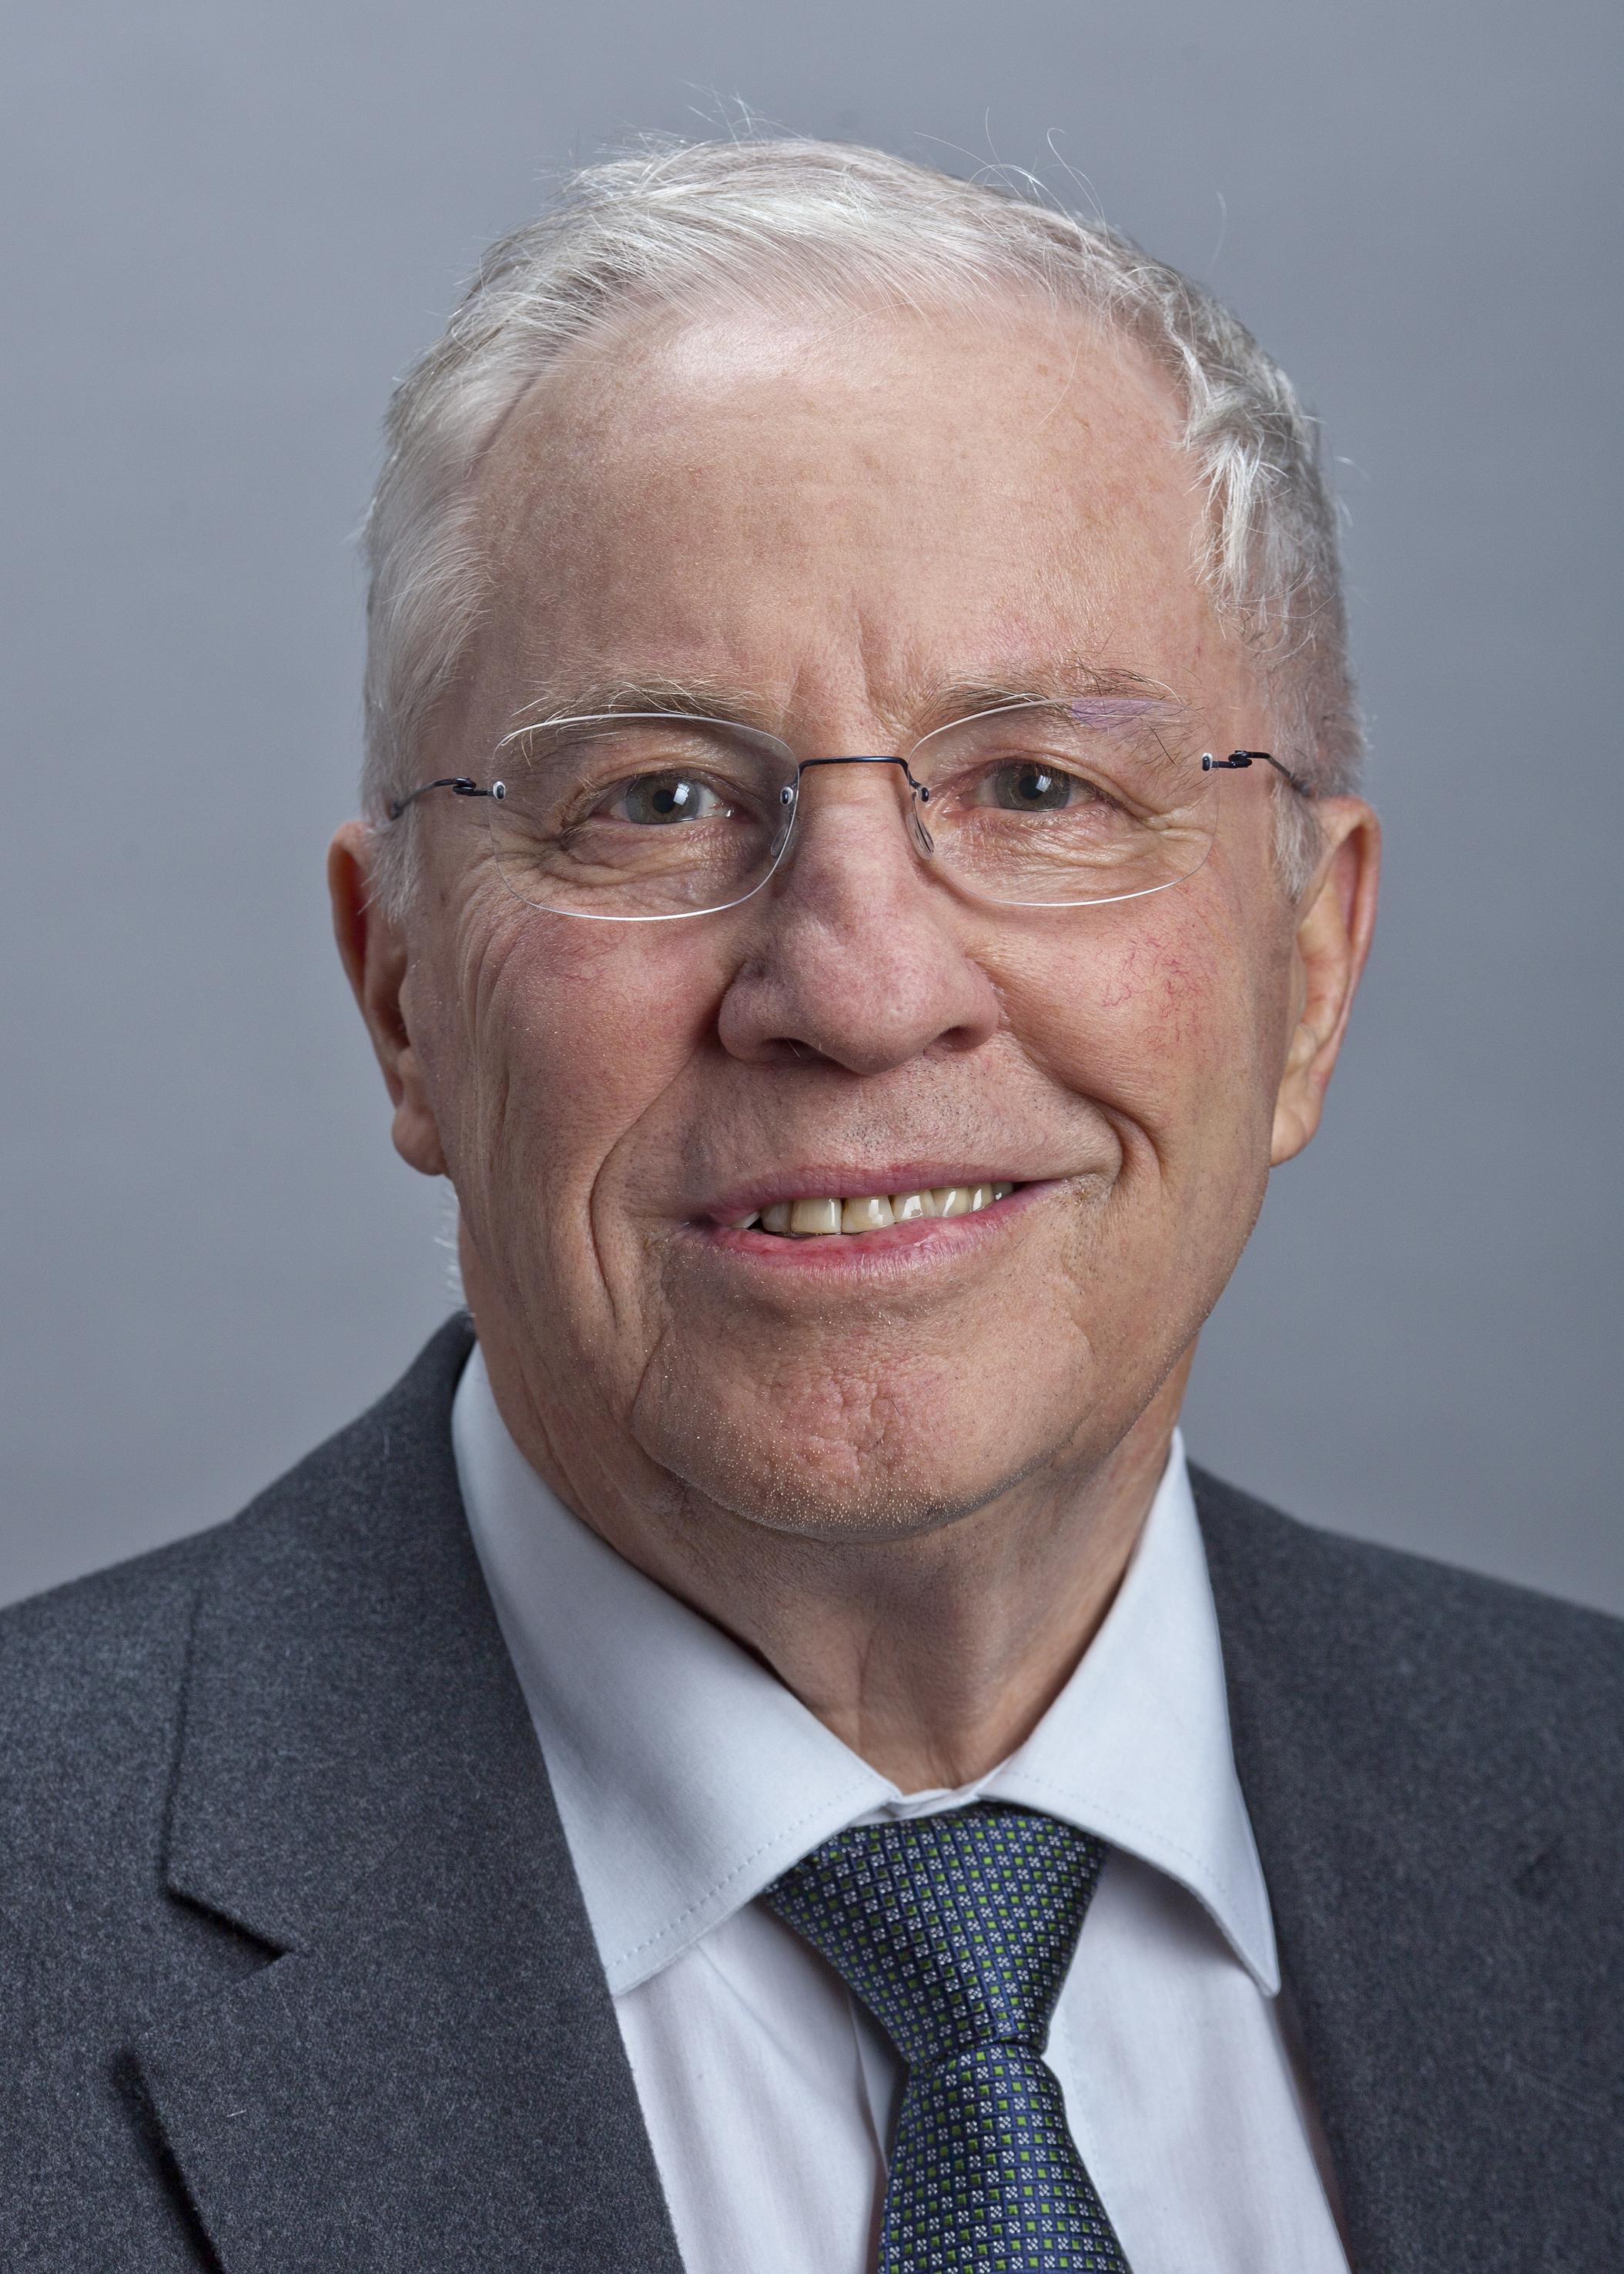 Christoph Blocher - Wikipedia